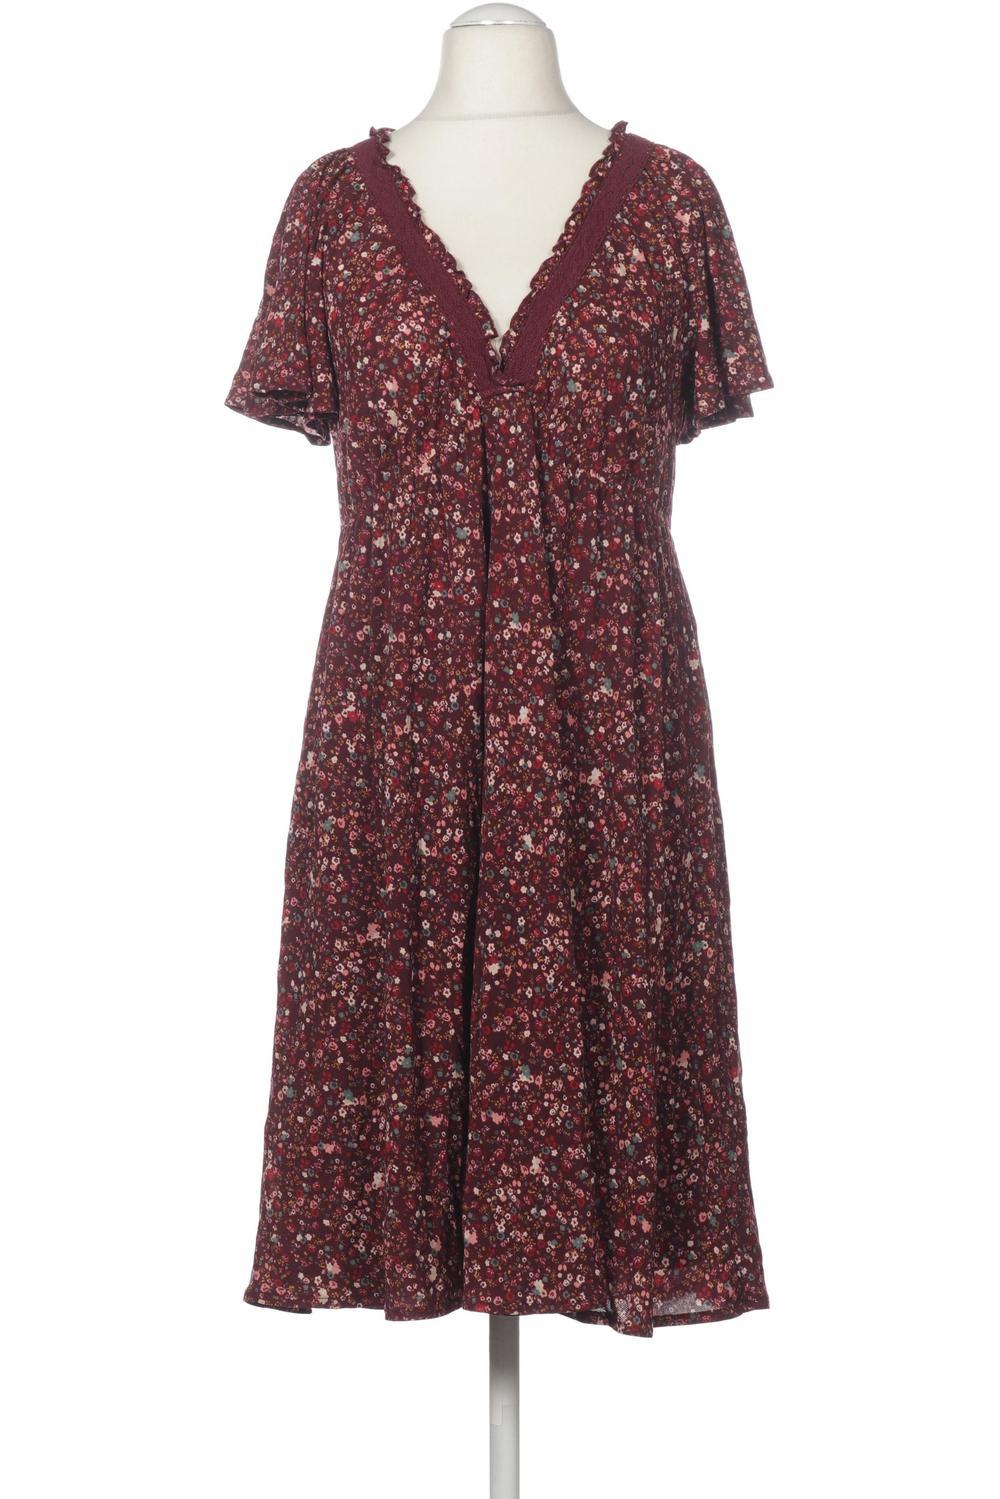 Esprit Kleid Damen Dress Damenkleid Gr. L braun #26d2173 ...